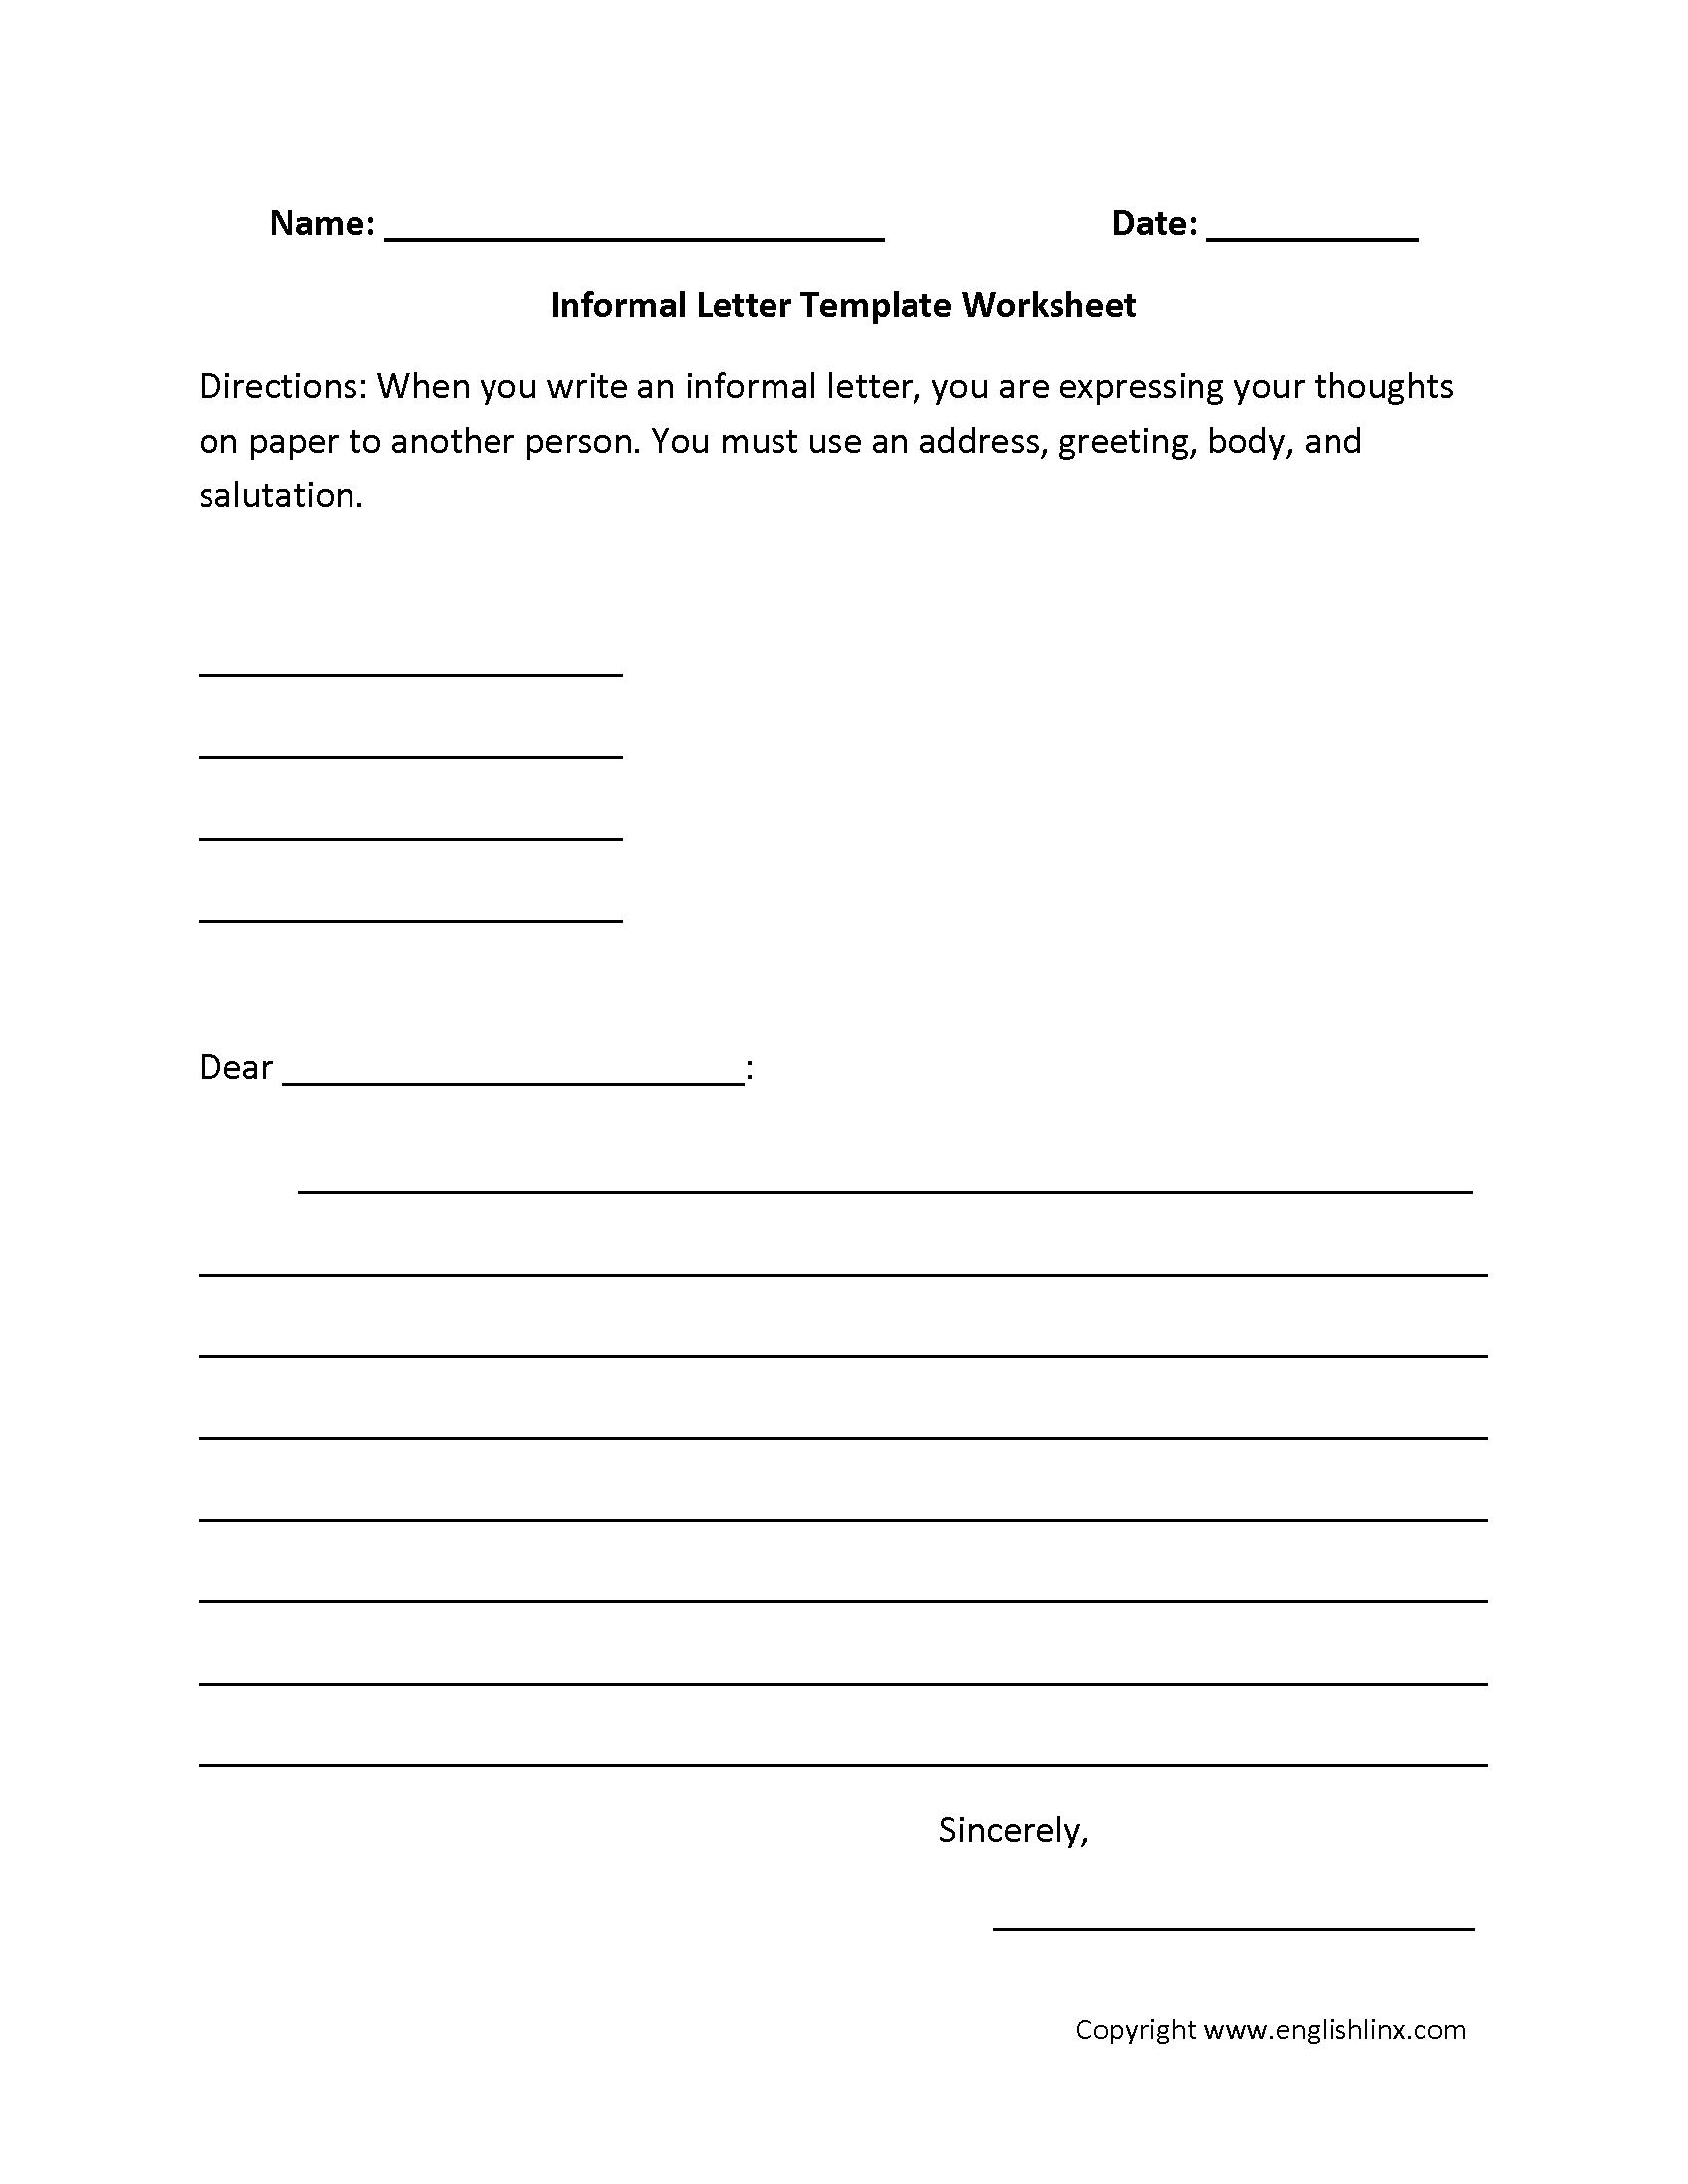 Informal Letter Writing Worksheets | Informal Letter Writing throughout Letter Writing Worksheets For Grade 5